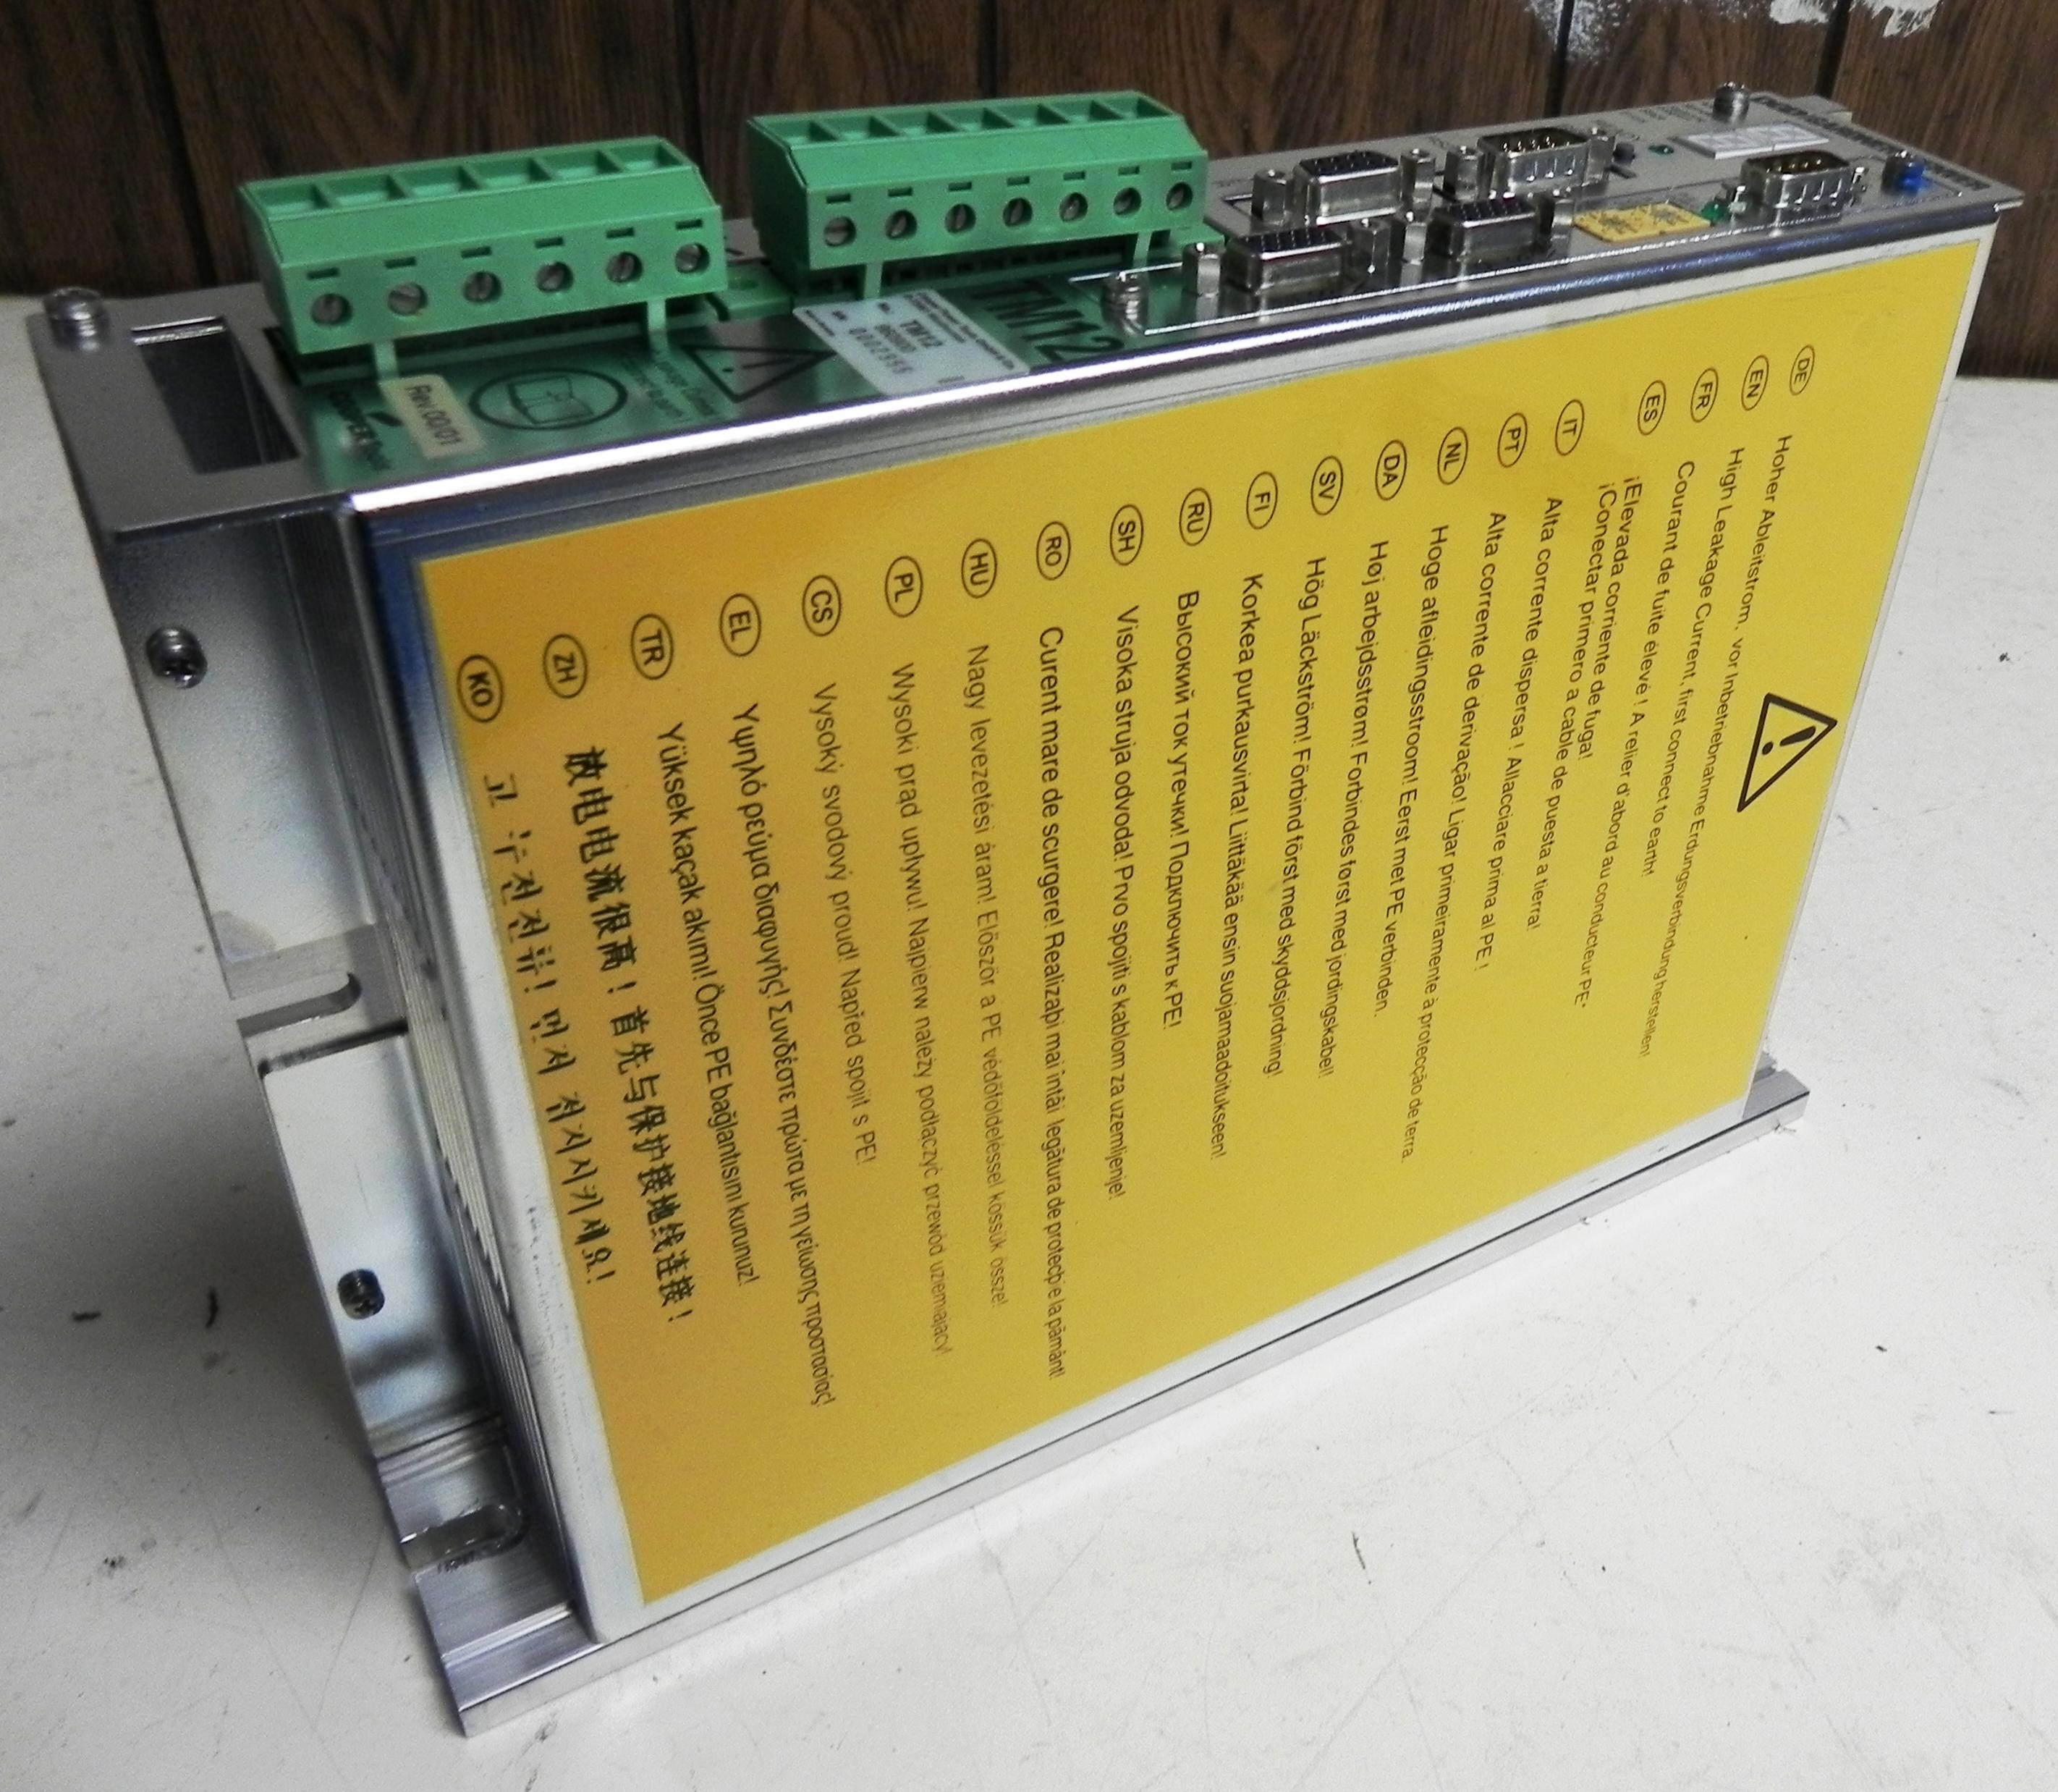 Lot 28 - Gardner Denver TM12 960900 Tightening Module